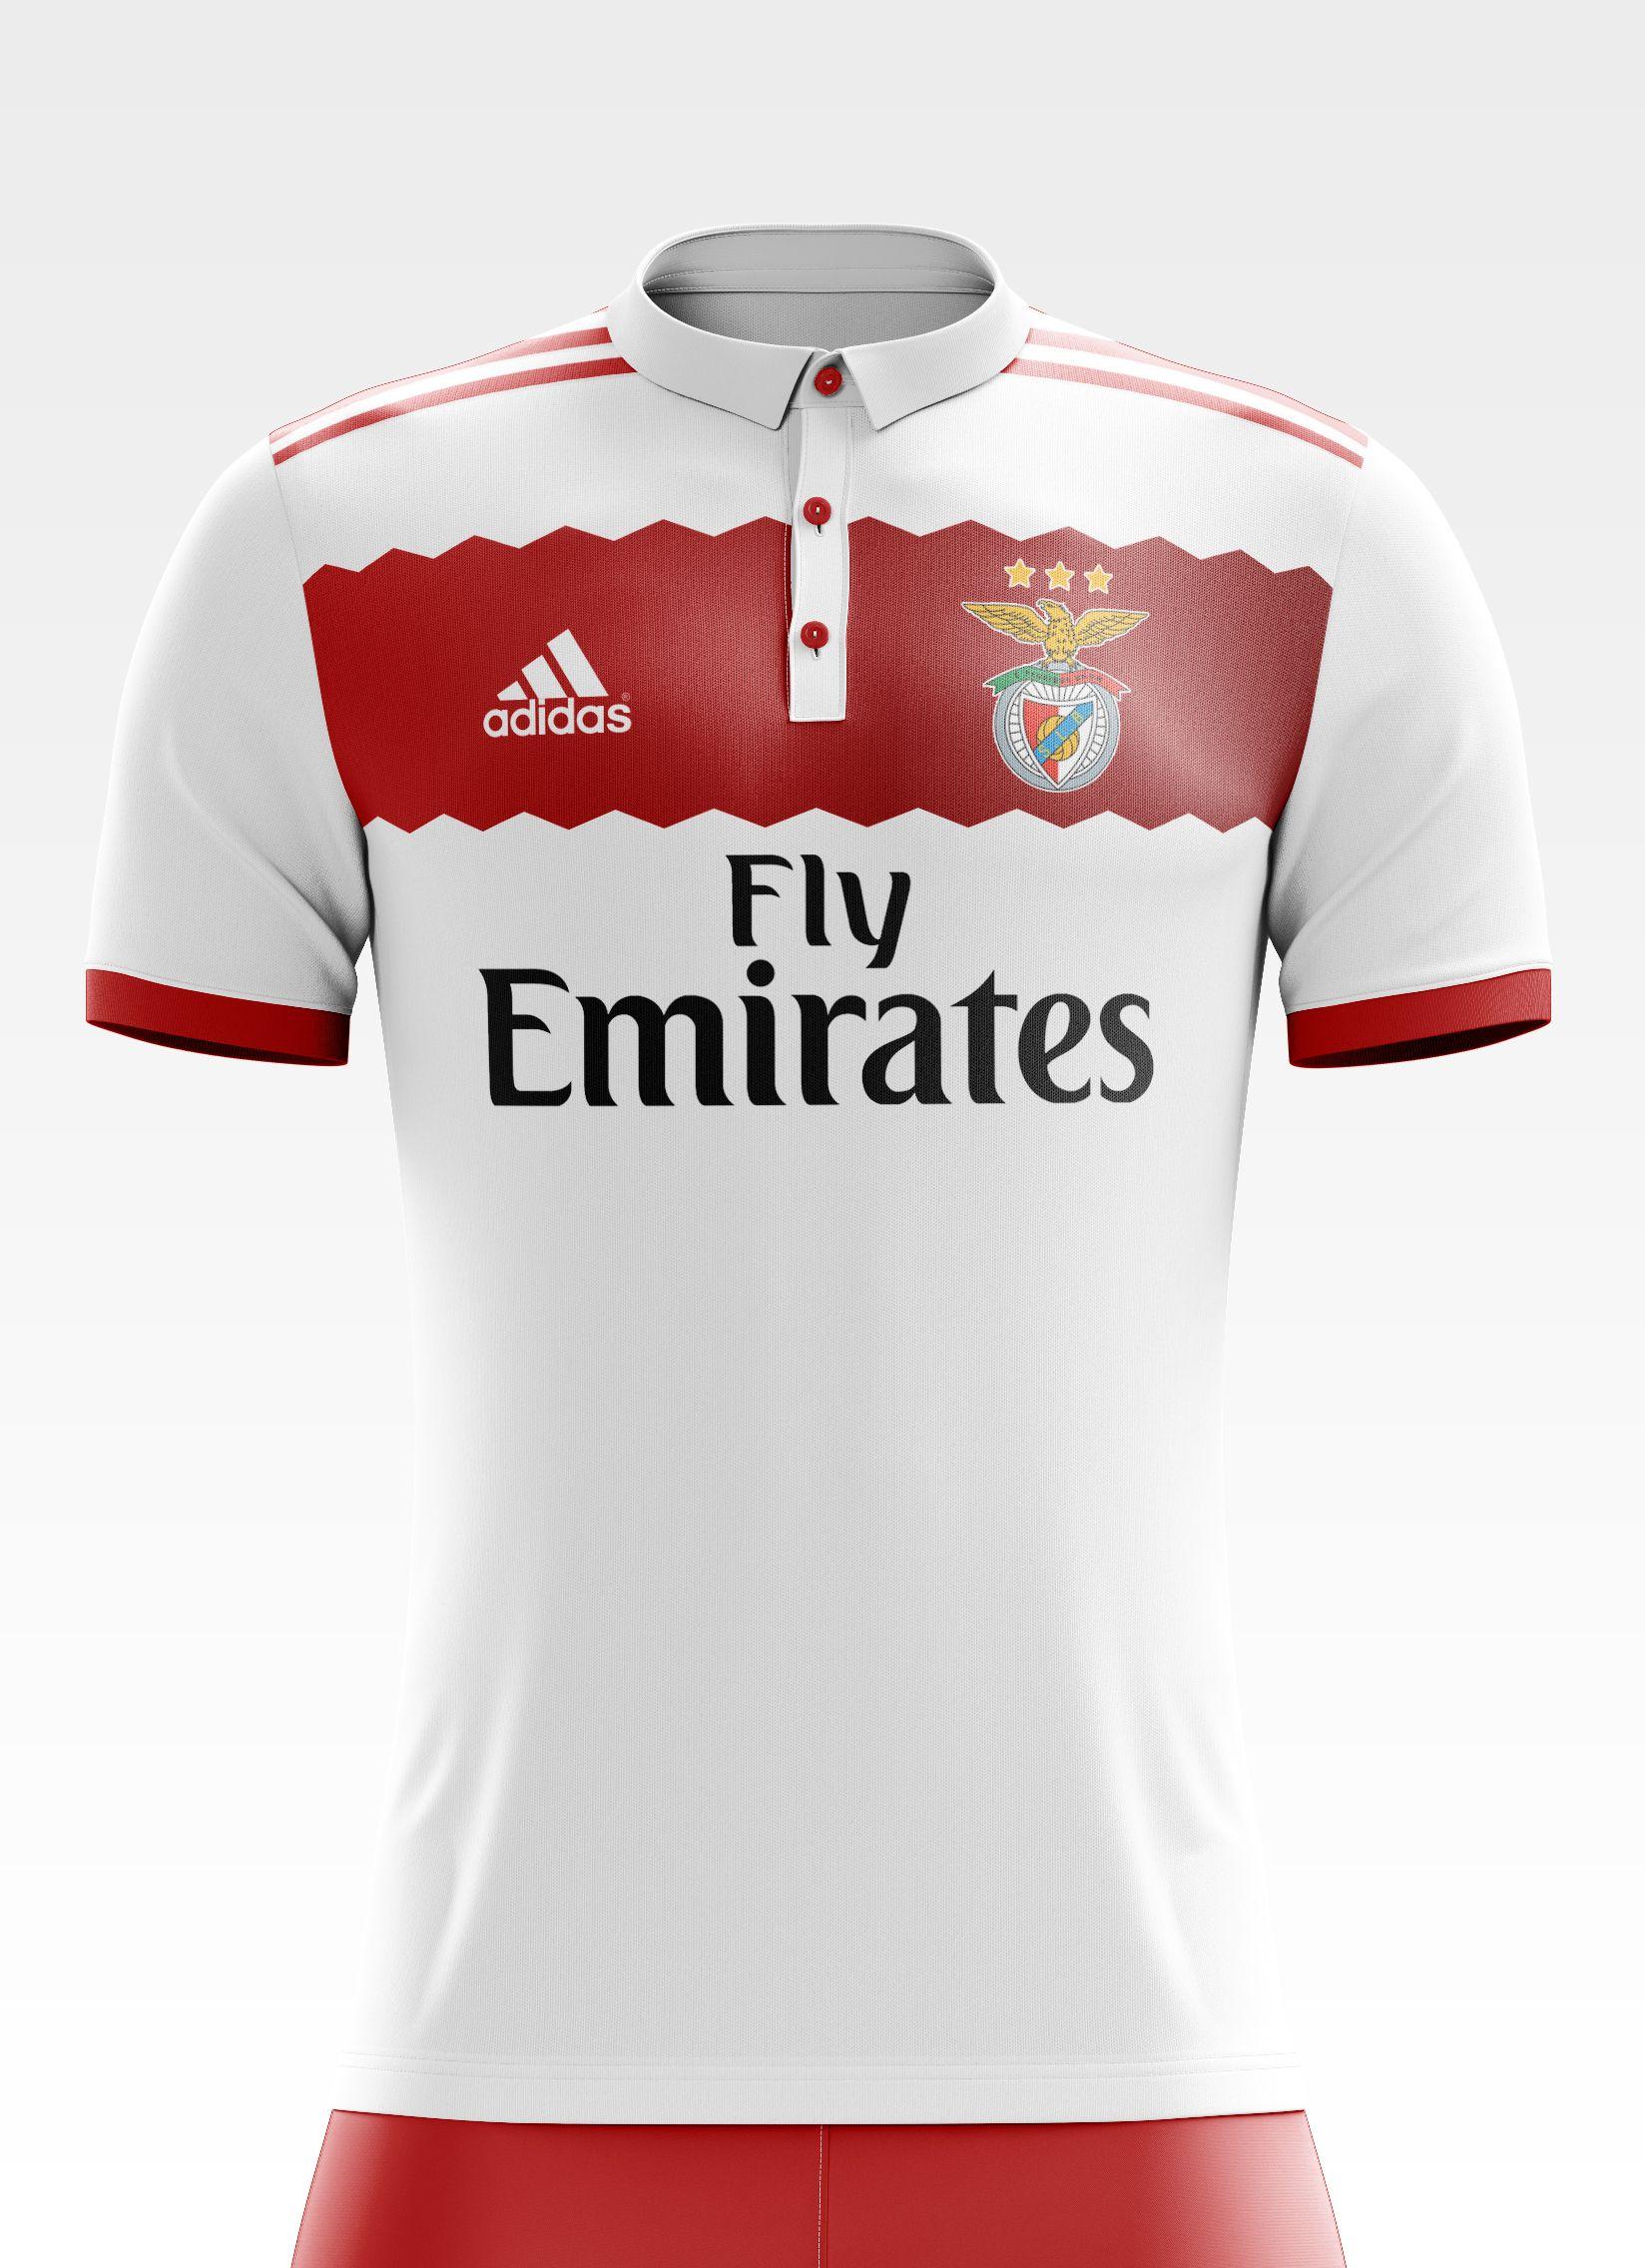 Football com category football kits image sl benfica 1st kit - I Designed Football Kits For Sl Benfica For The Upcoming Season 17 18